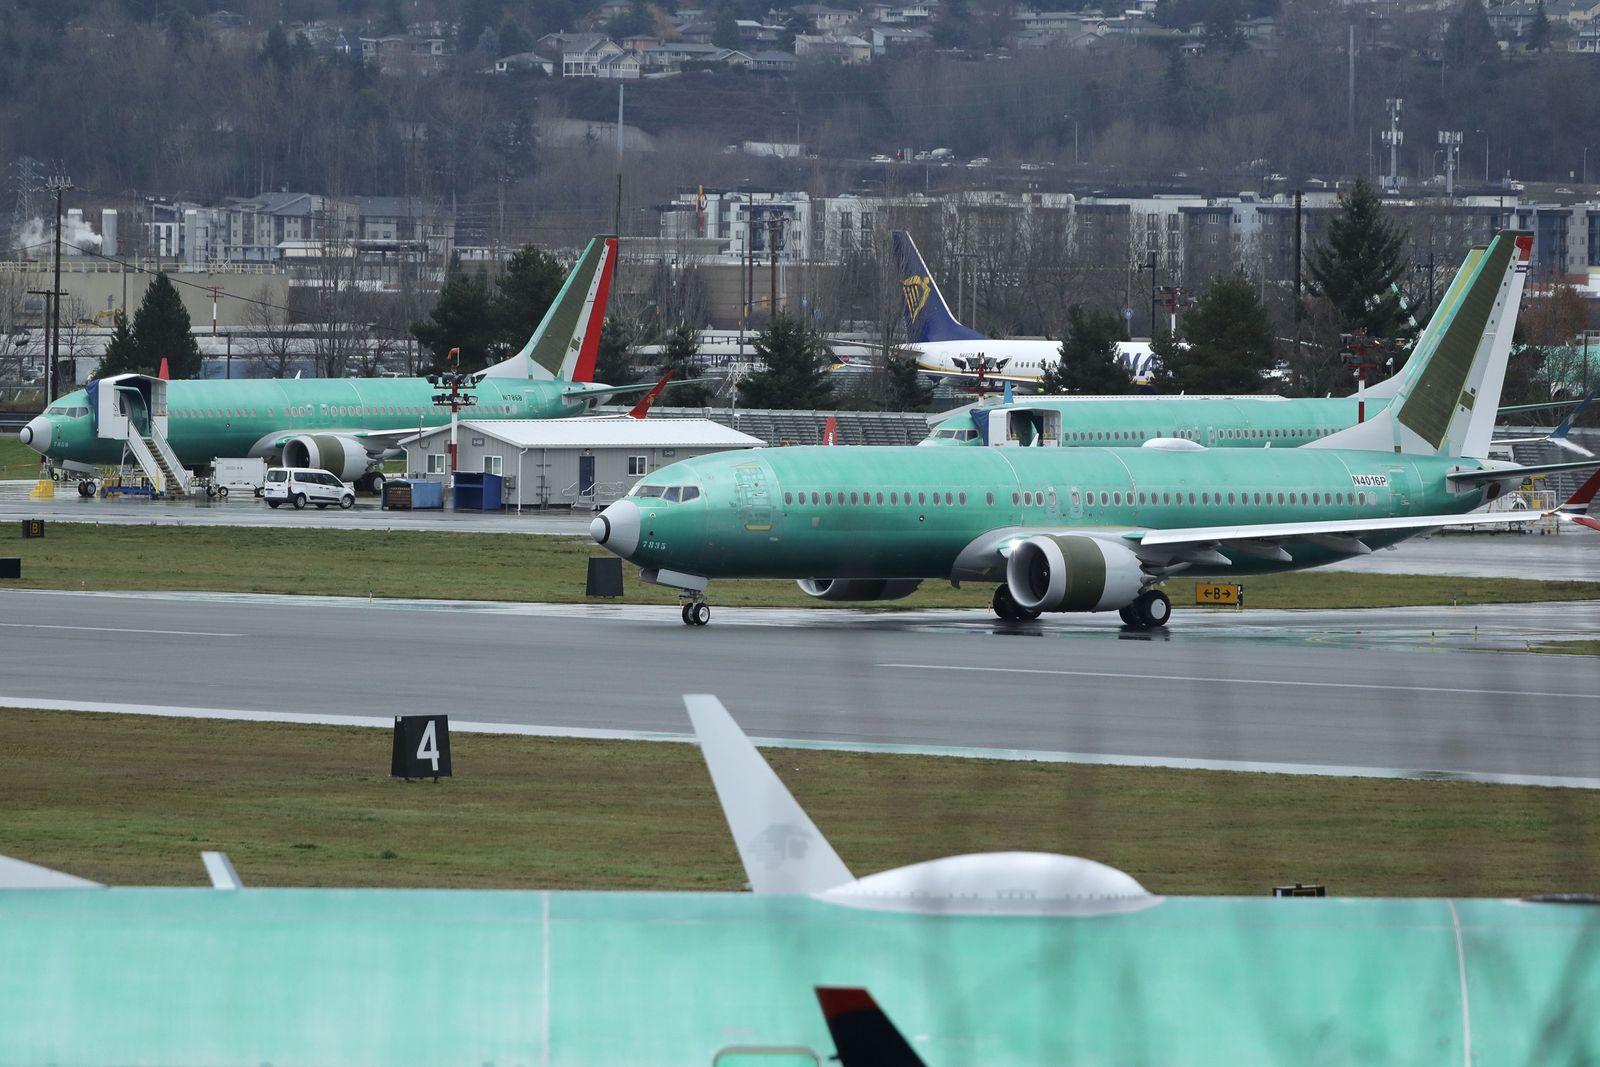 Boeing 737 MAX/ genaue Untersuchung